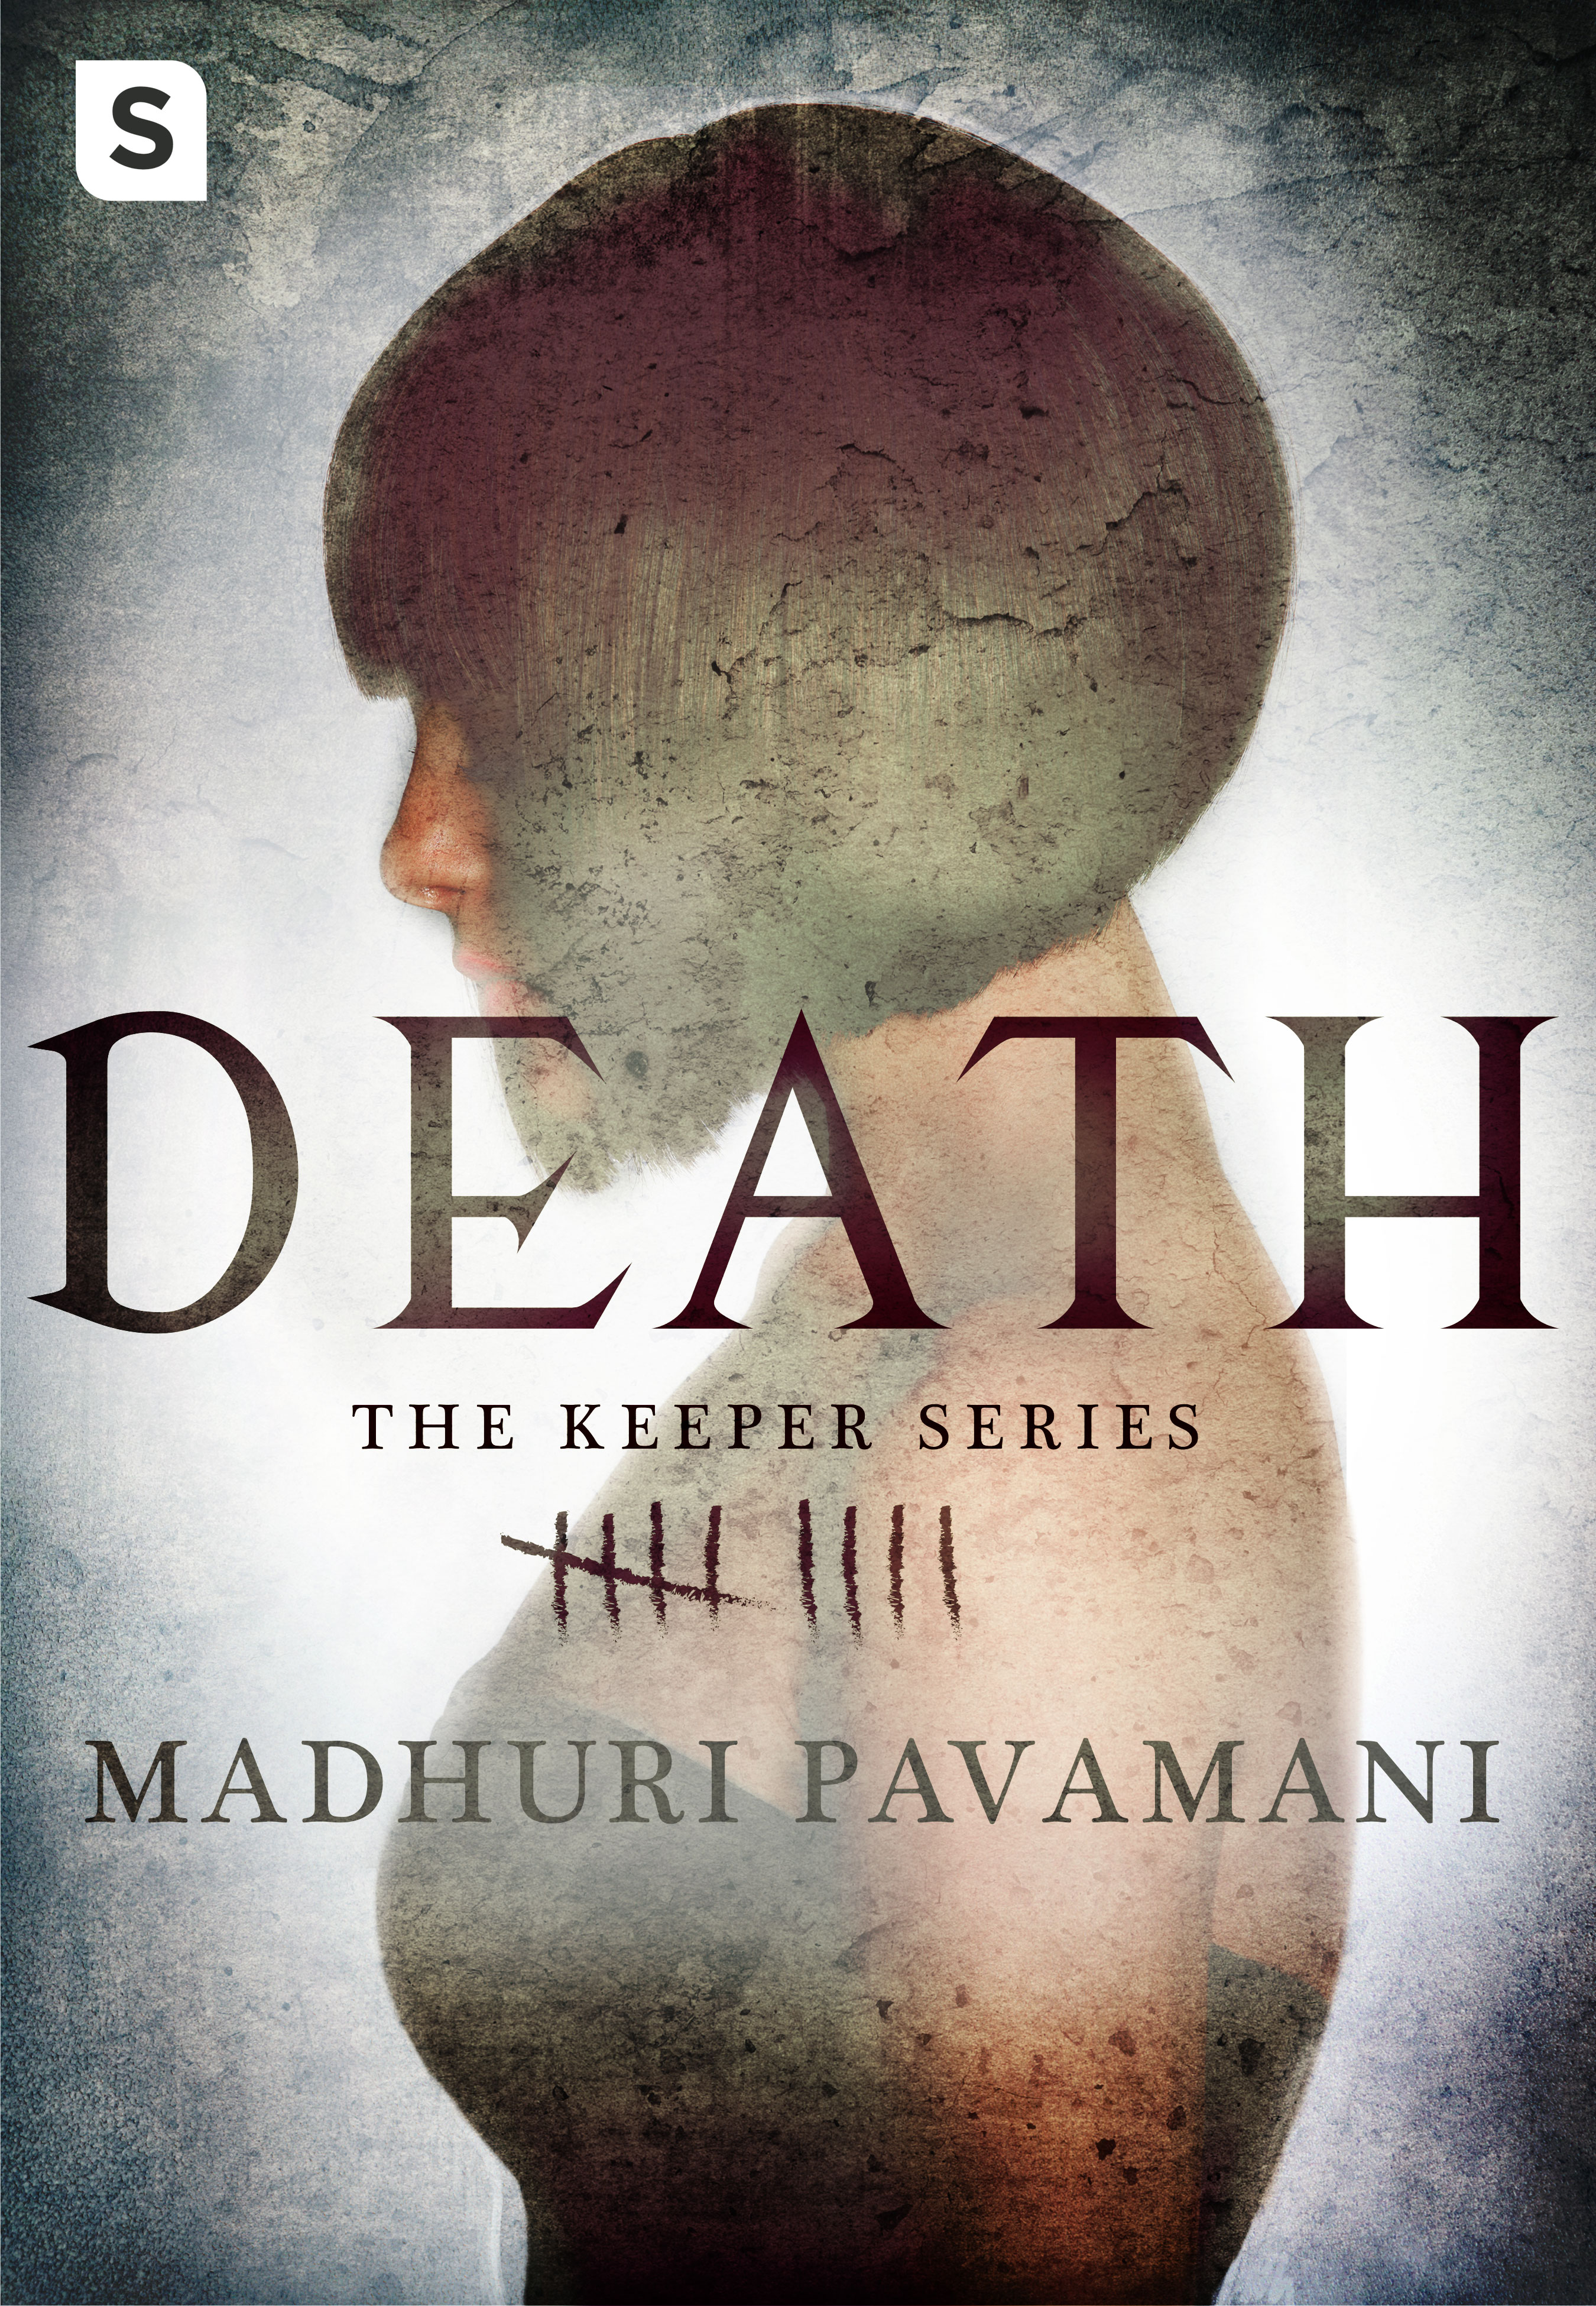 DEATH Cover – Madhuri Pavamani